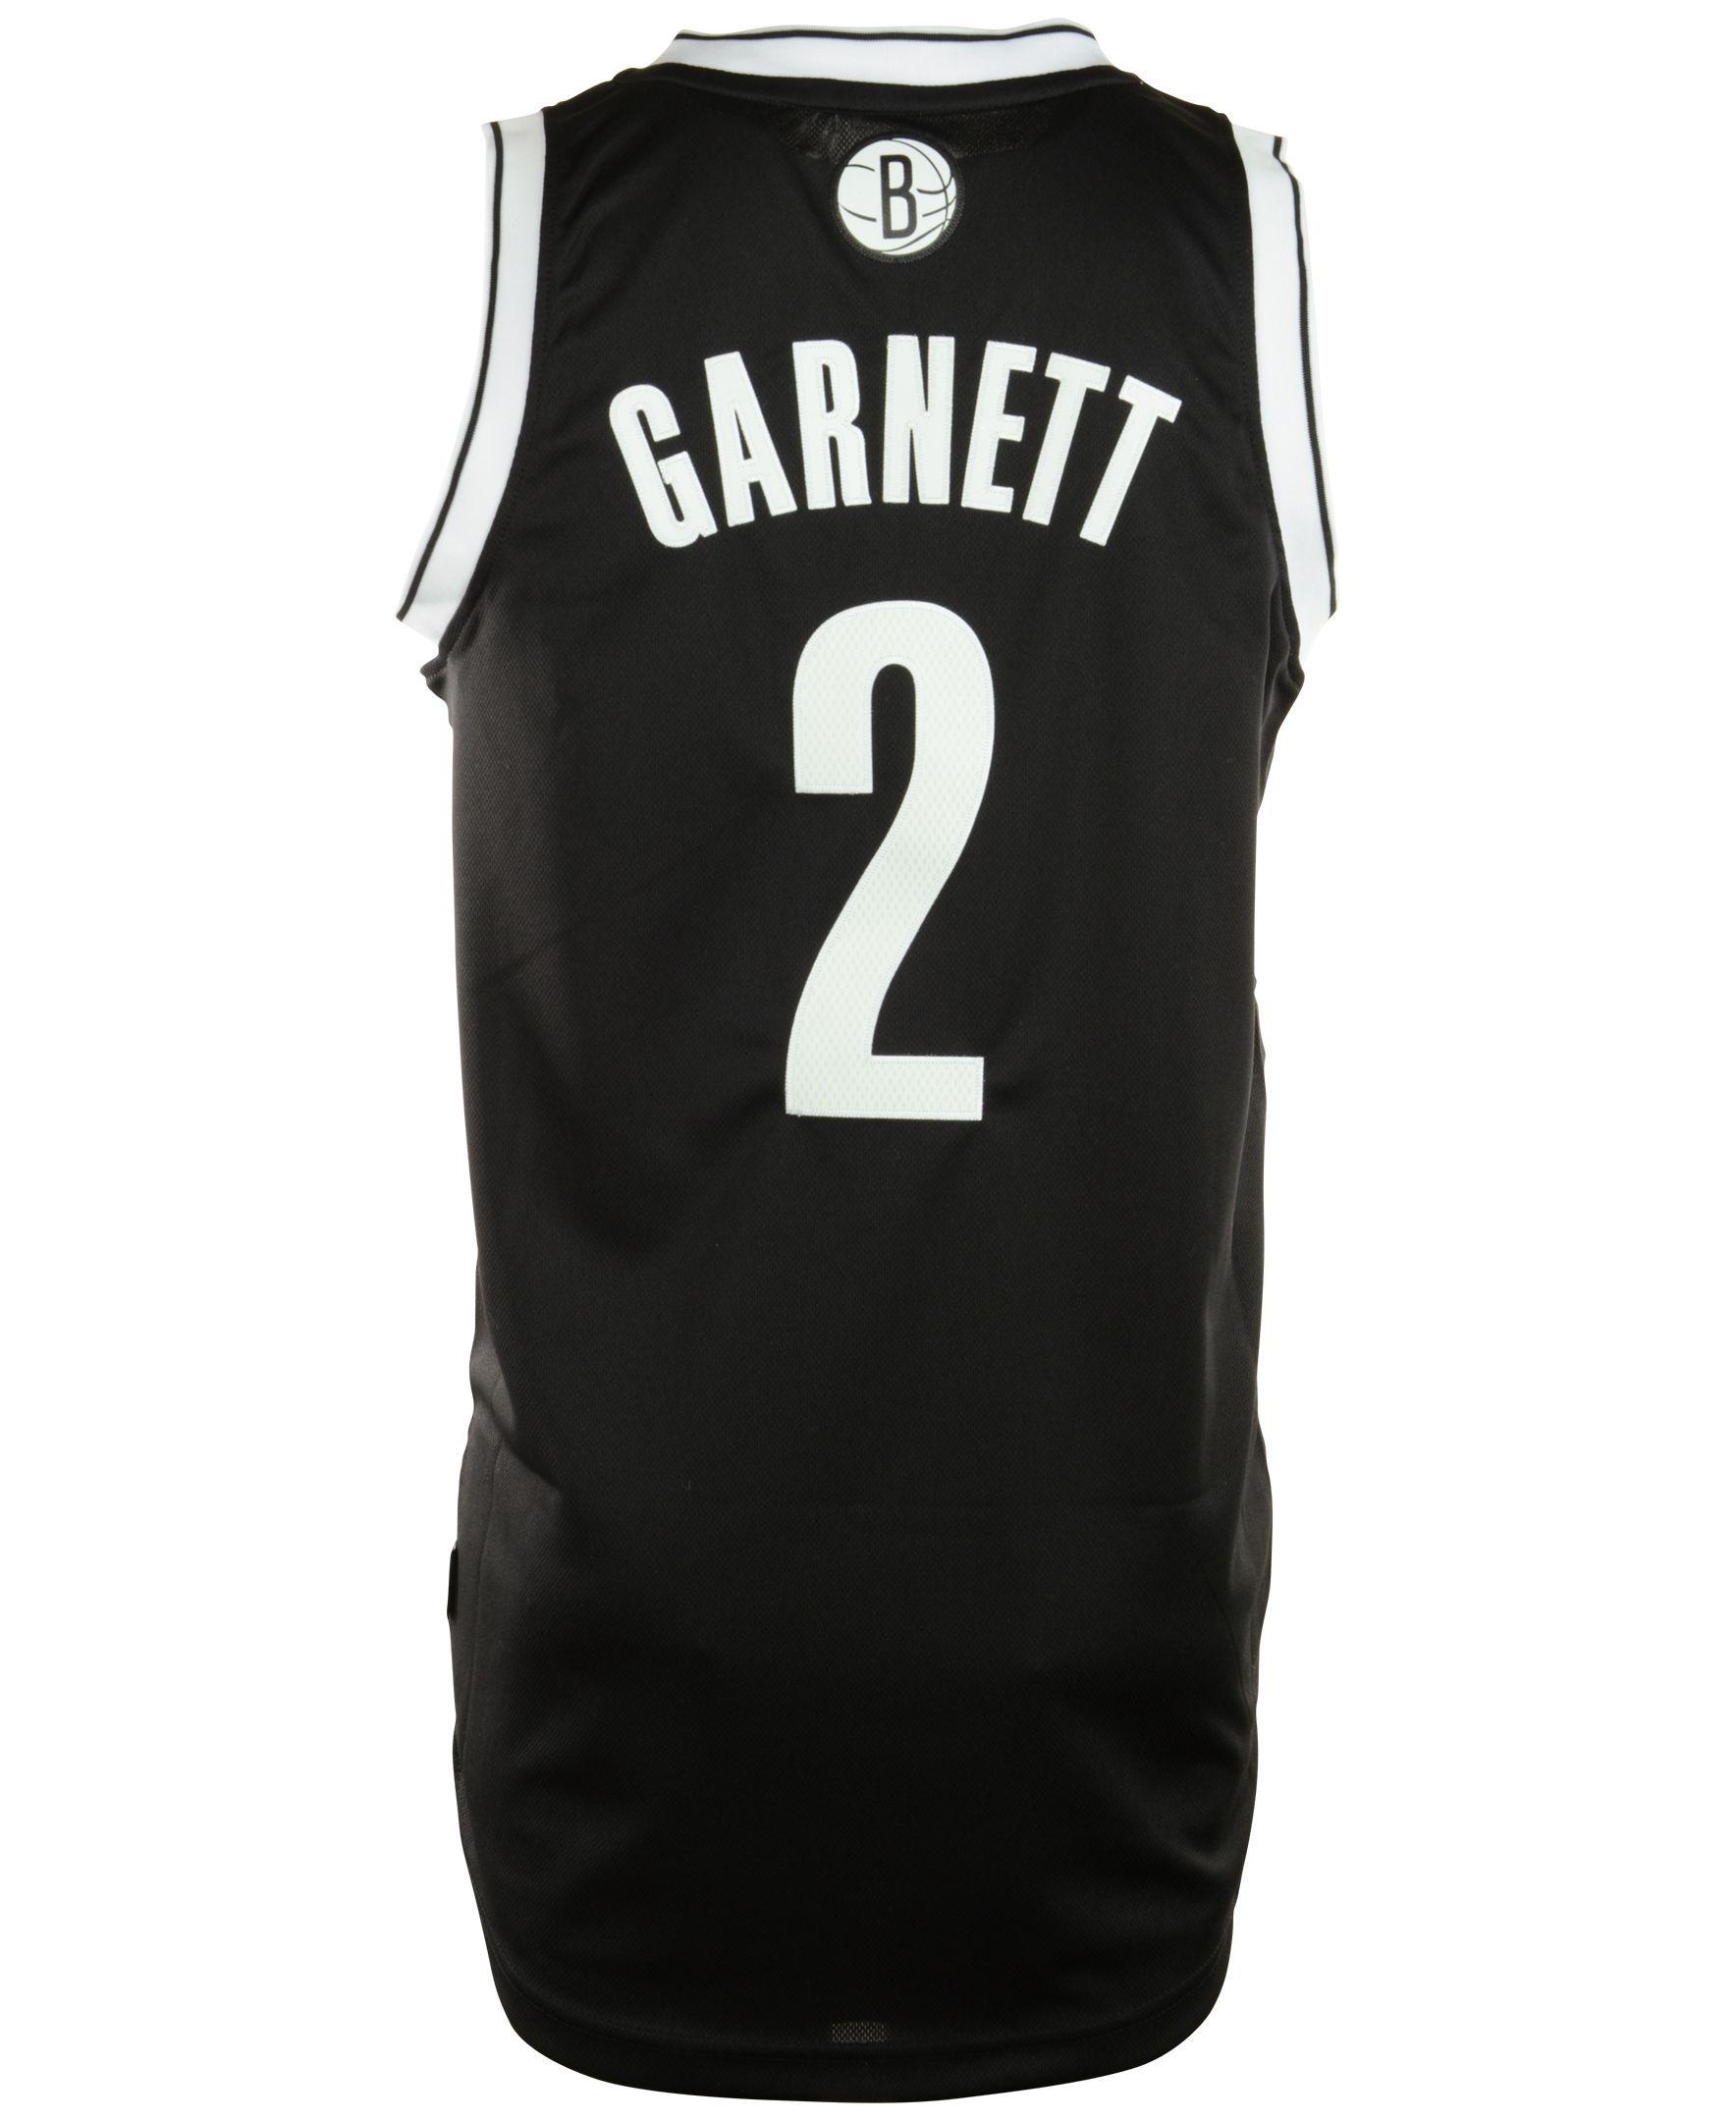 brand new 7c5d6 6db3f adidas Men's Kevin Garnett Brooklyn Nets Revolution 30 ...